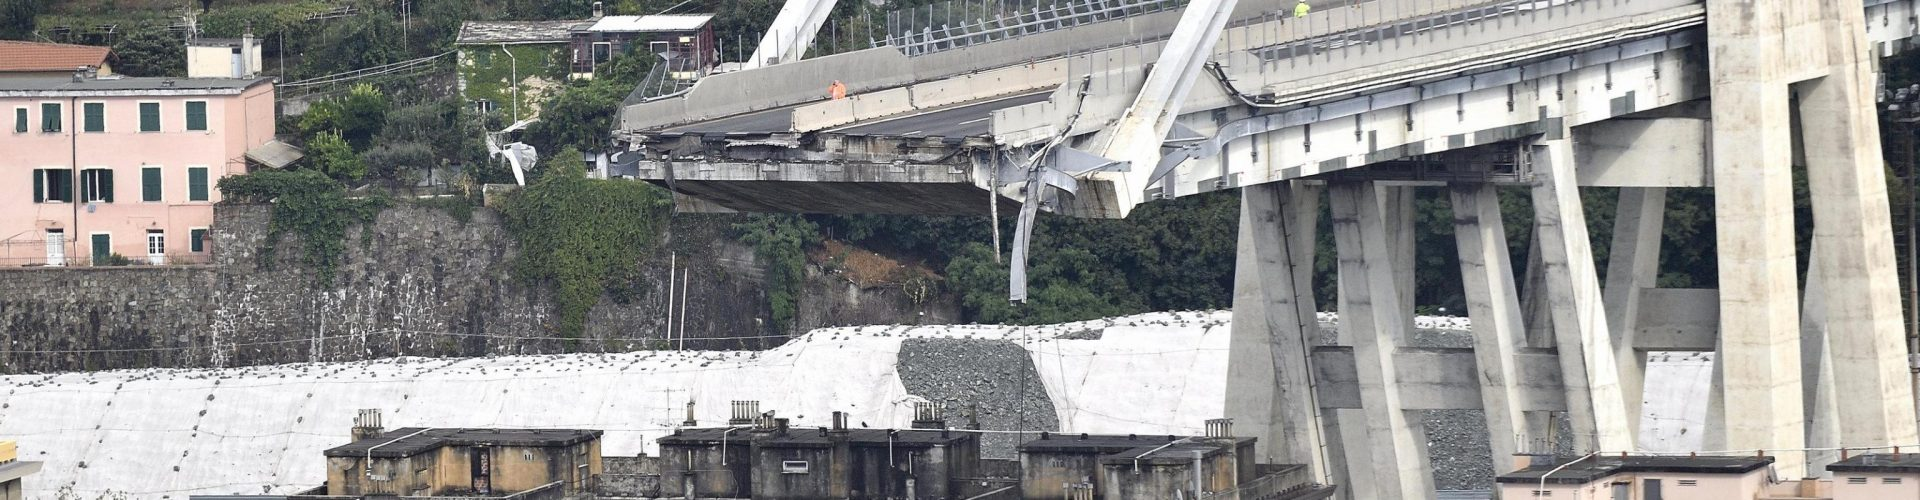 Genova: le tensioni sociali all'ombra del Ponte Morandi